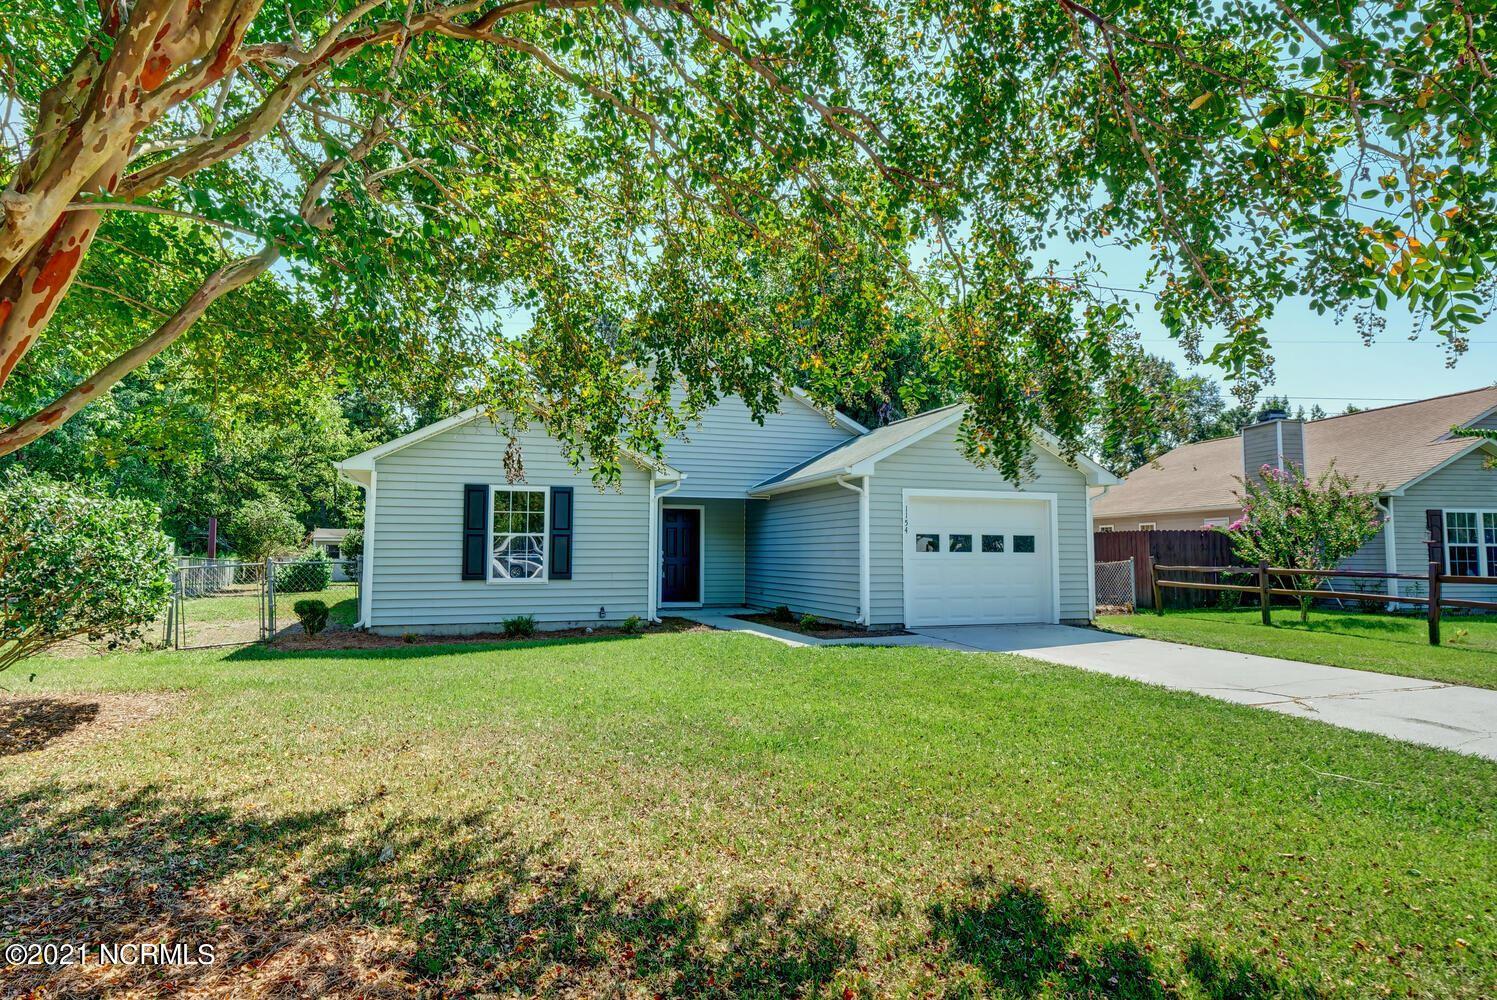 Photo of 1154 Shroyer Circle, Jacksonville, NC 28540 (MLS # 100290424)